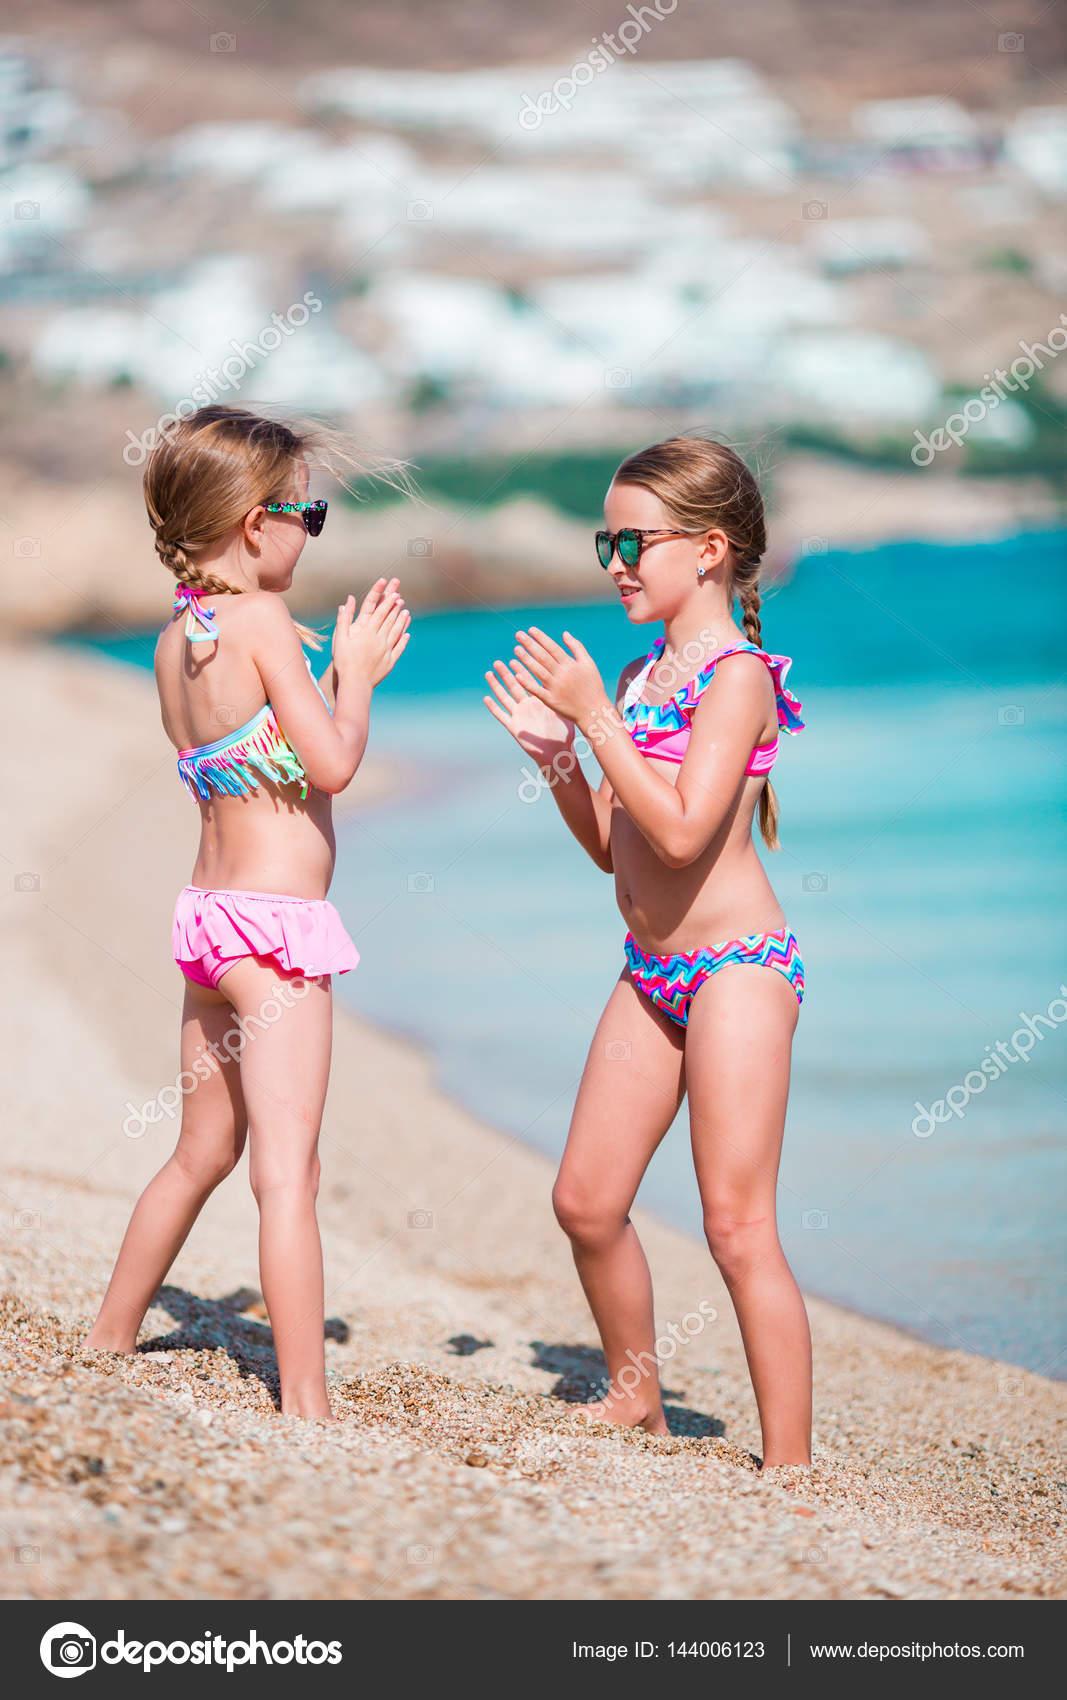 d03c3aeeaee91 Adorable little girls having fun during beach vacation — Stock Photo ...